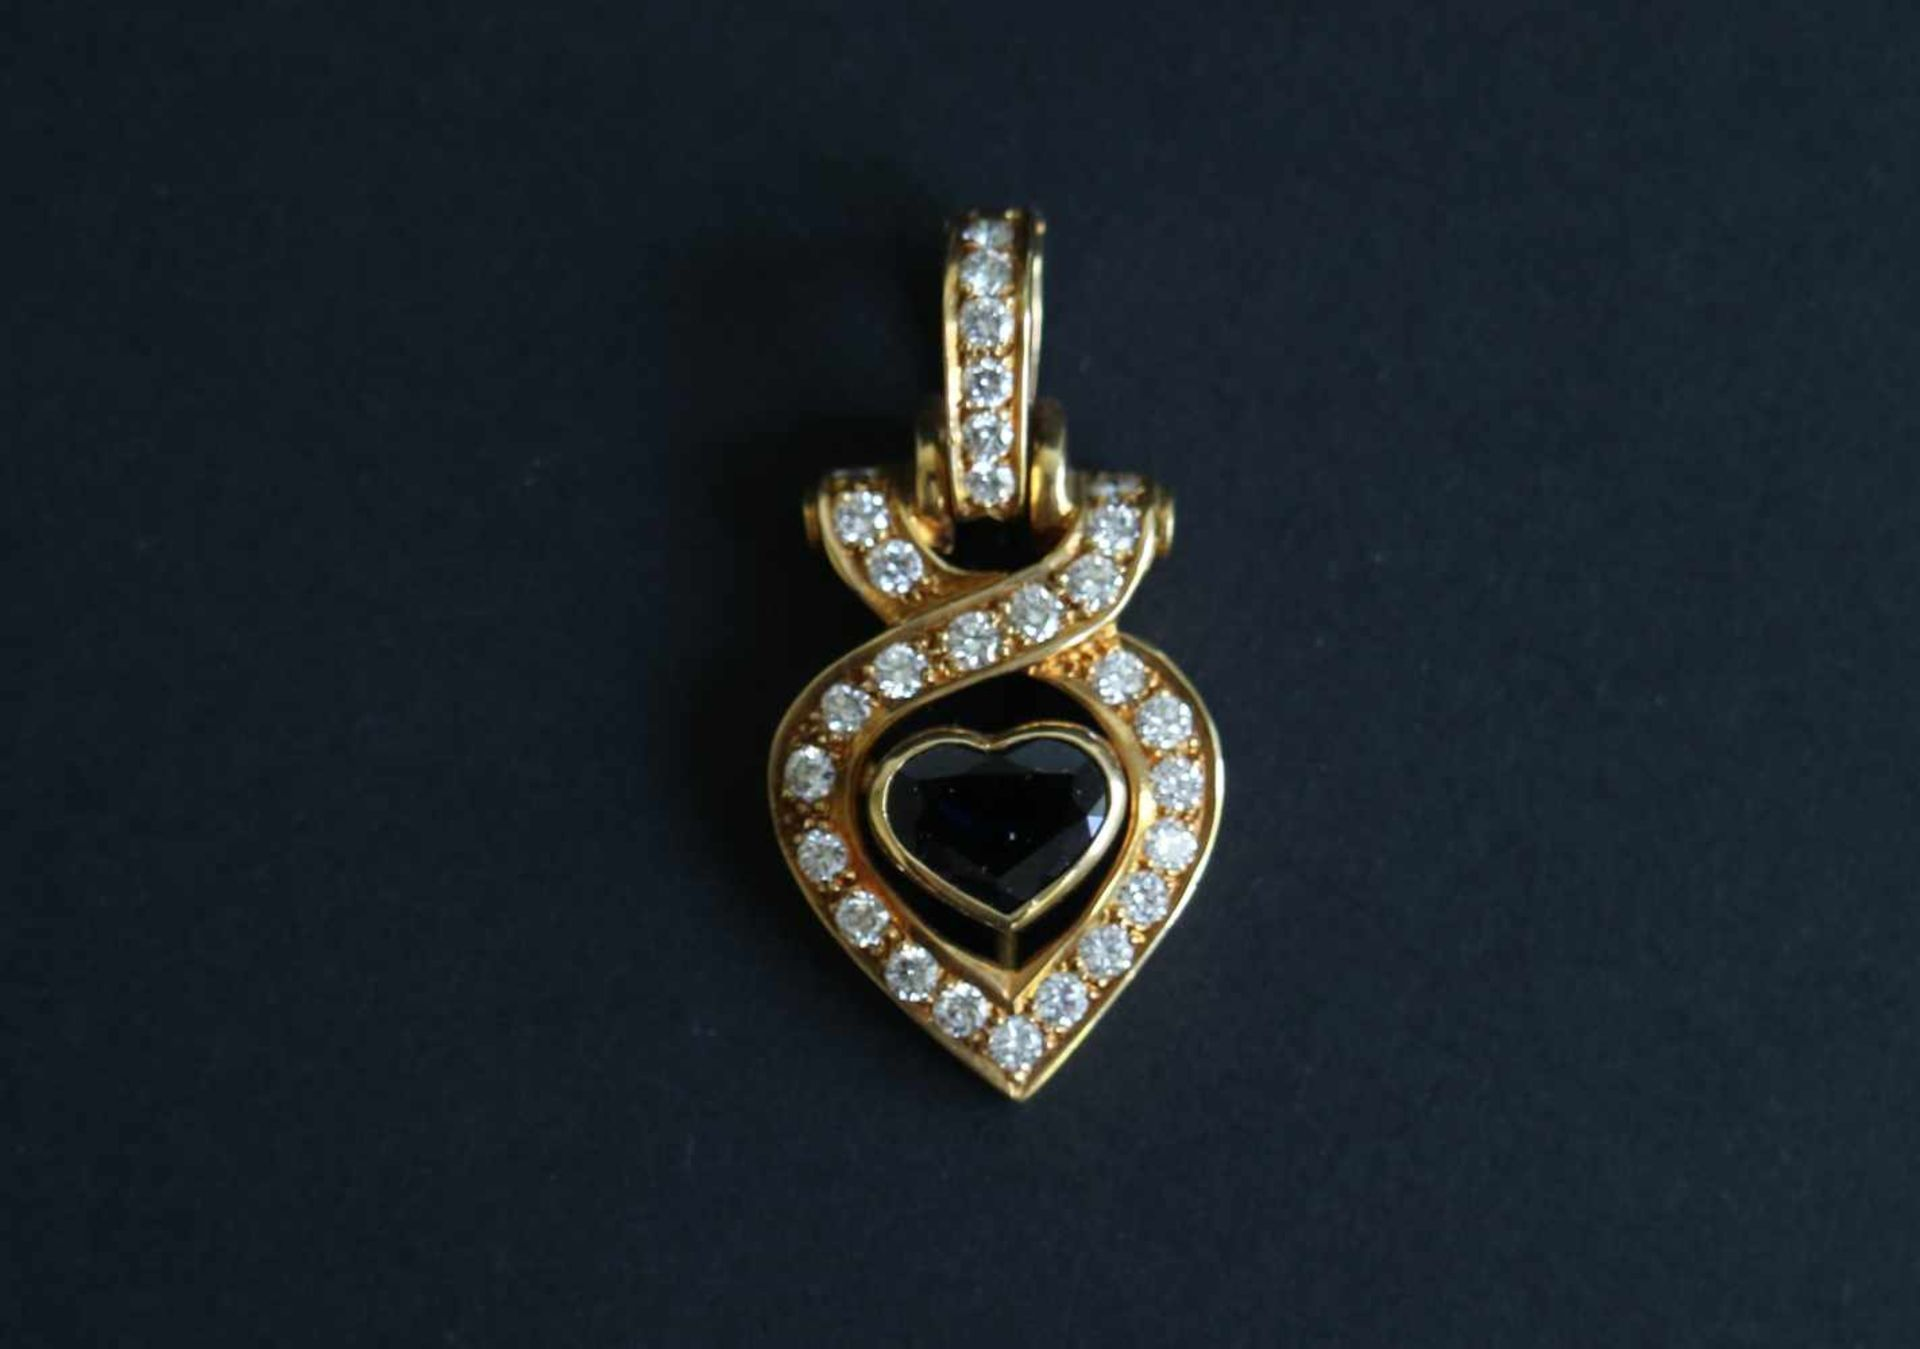 Los 941 - Pendant with blue sapphire 1.1 carat diamond, gold 18 Kt, quality VS / F-G